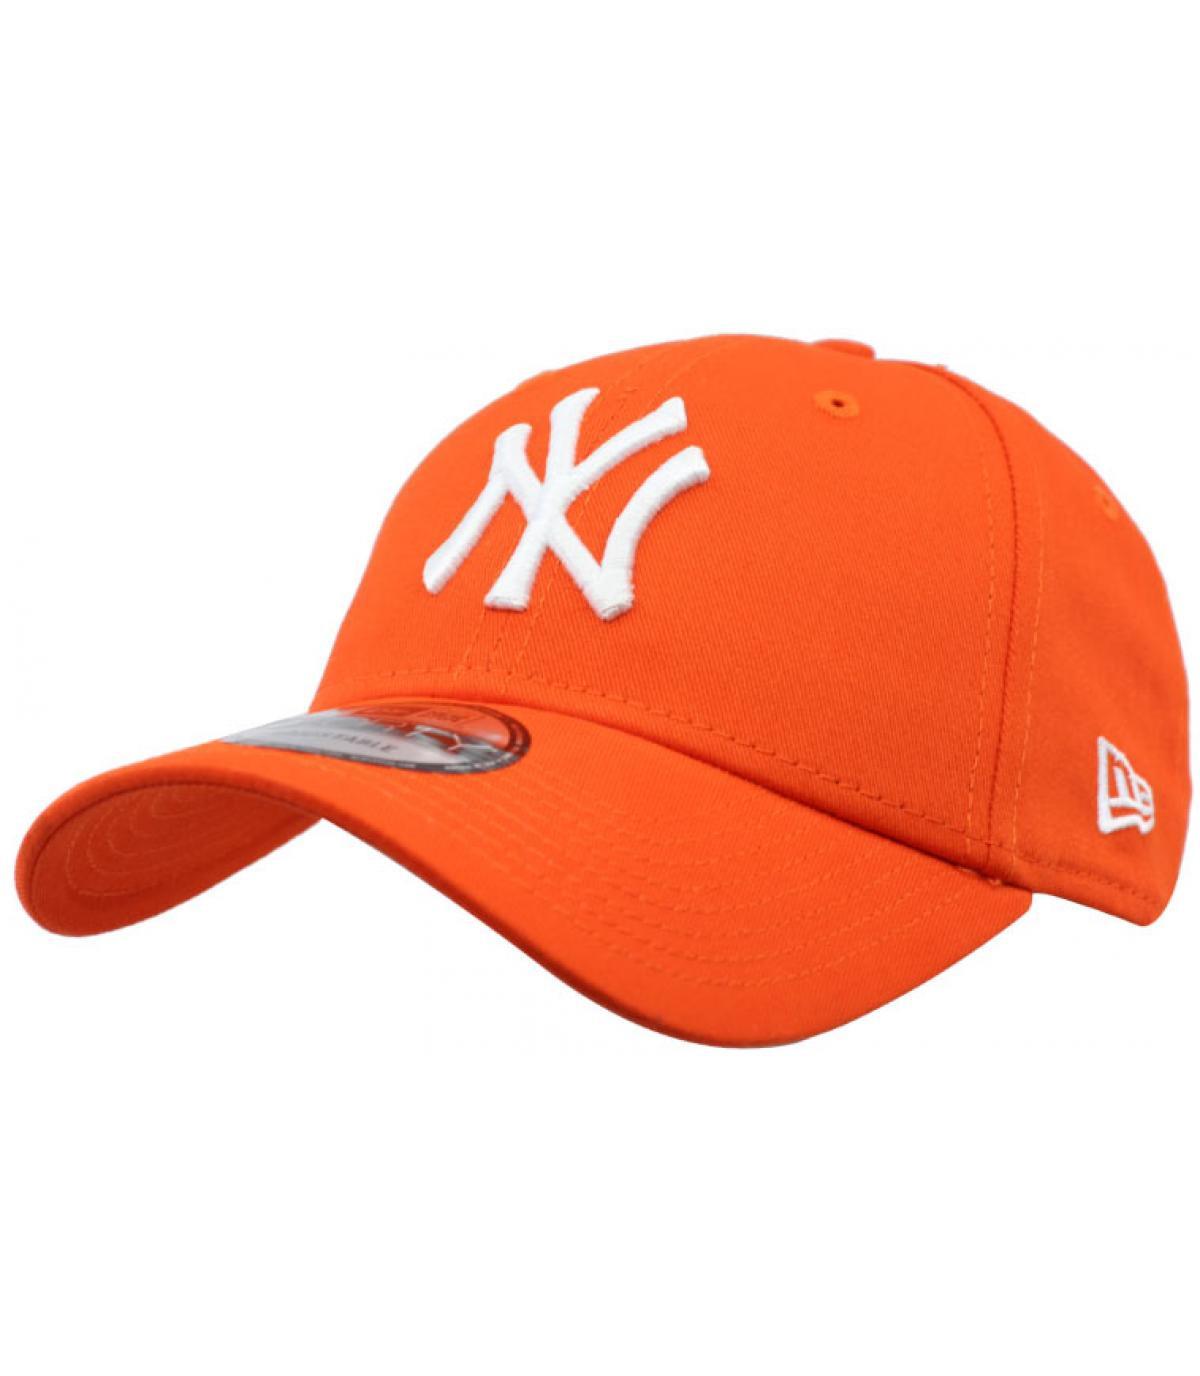 Details League Ess 9Forty NY orange - afbeeling 2